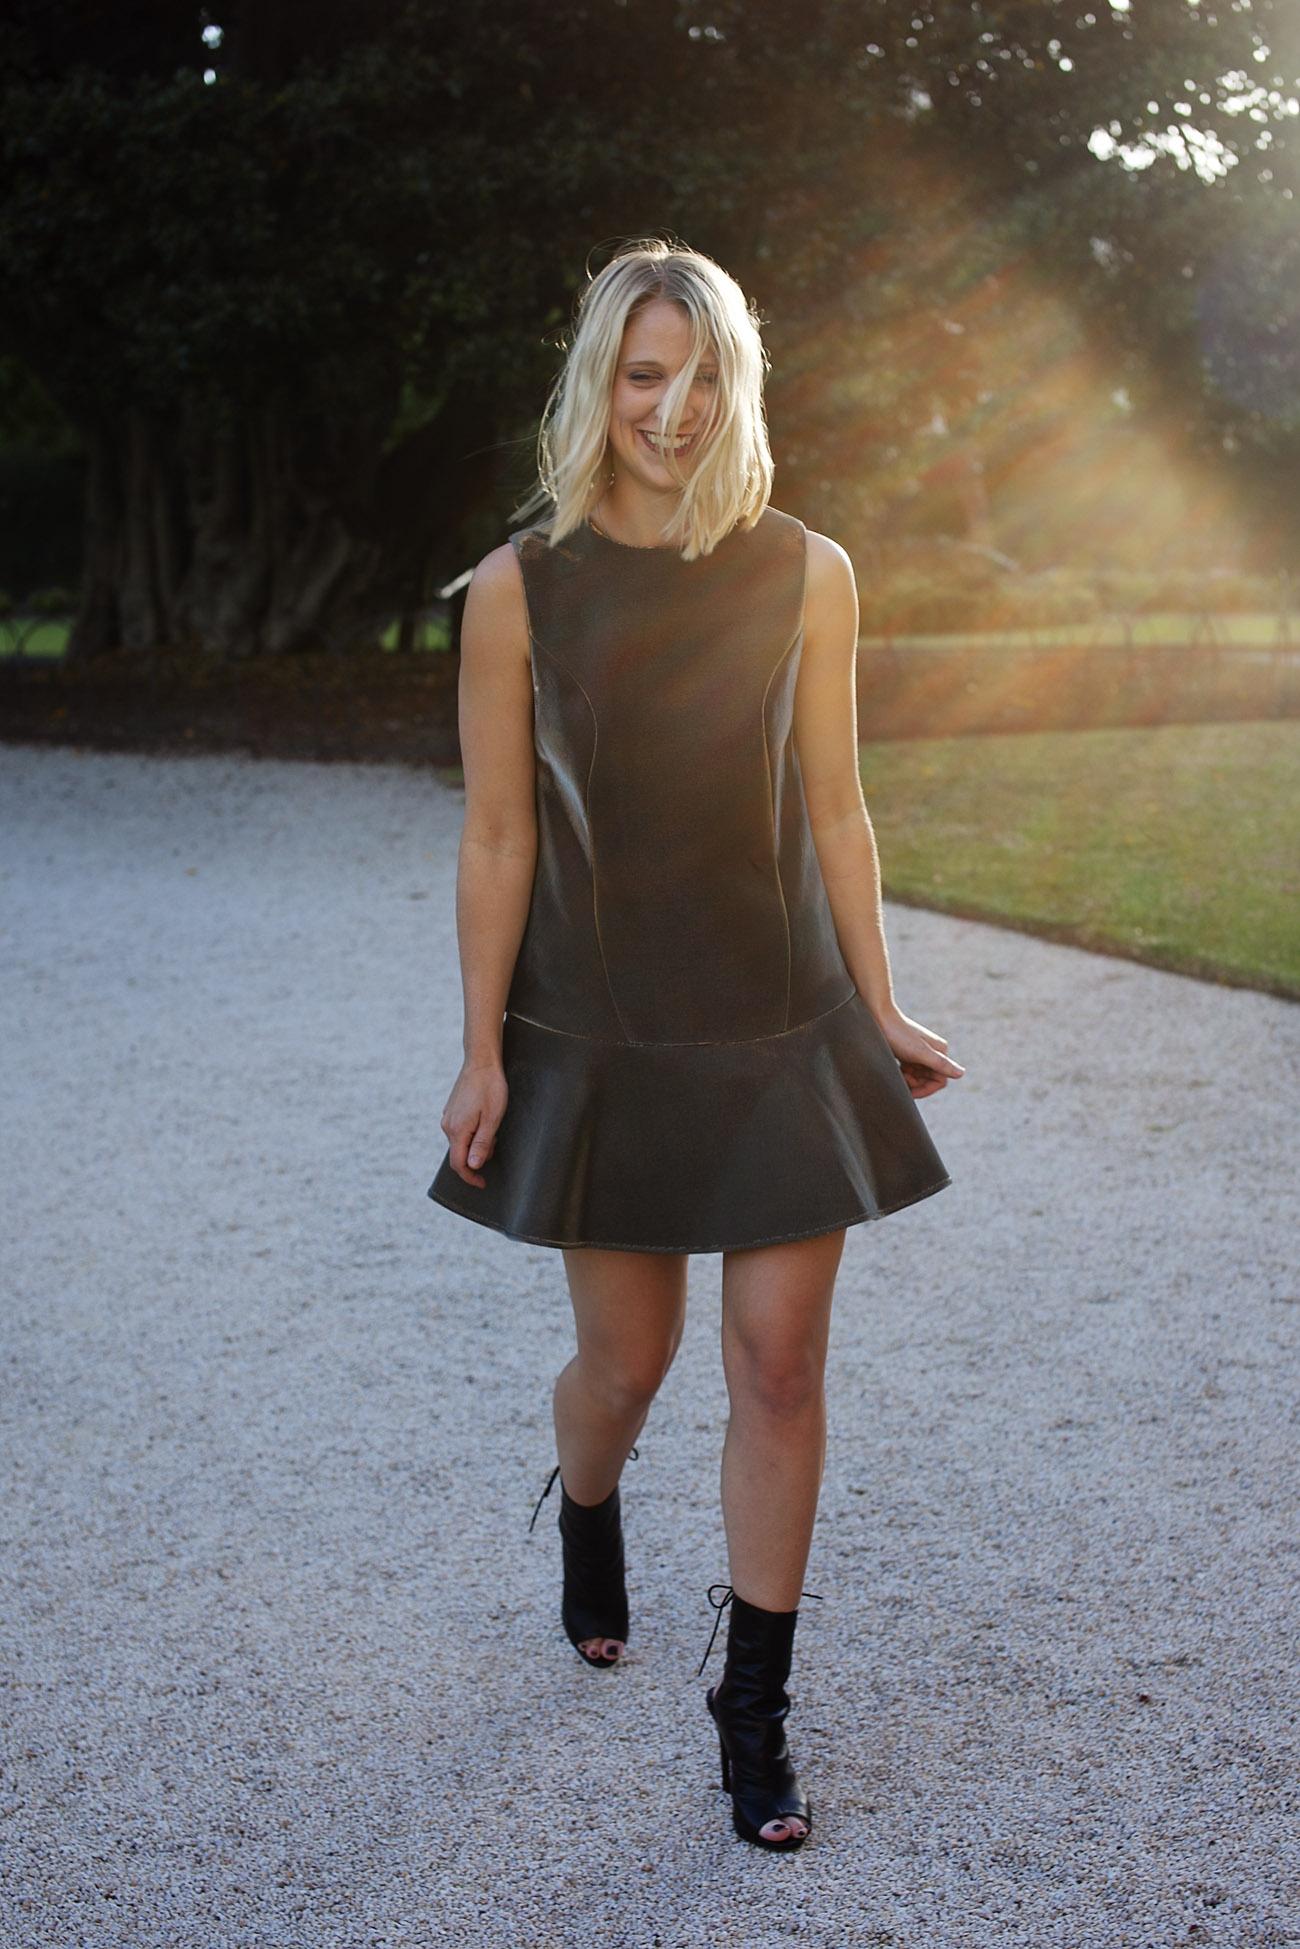 Finders Keepers designer Amy Hicks